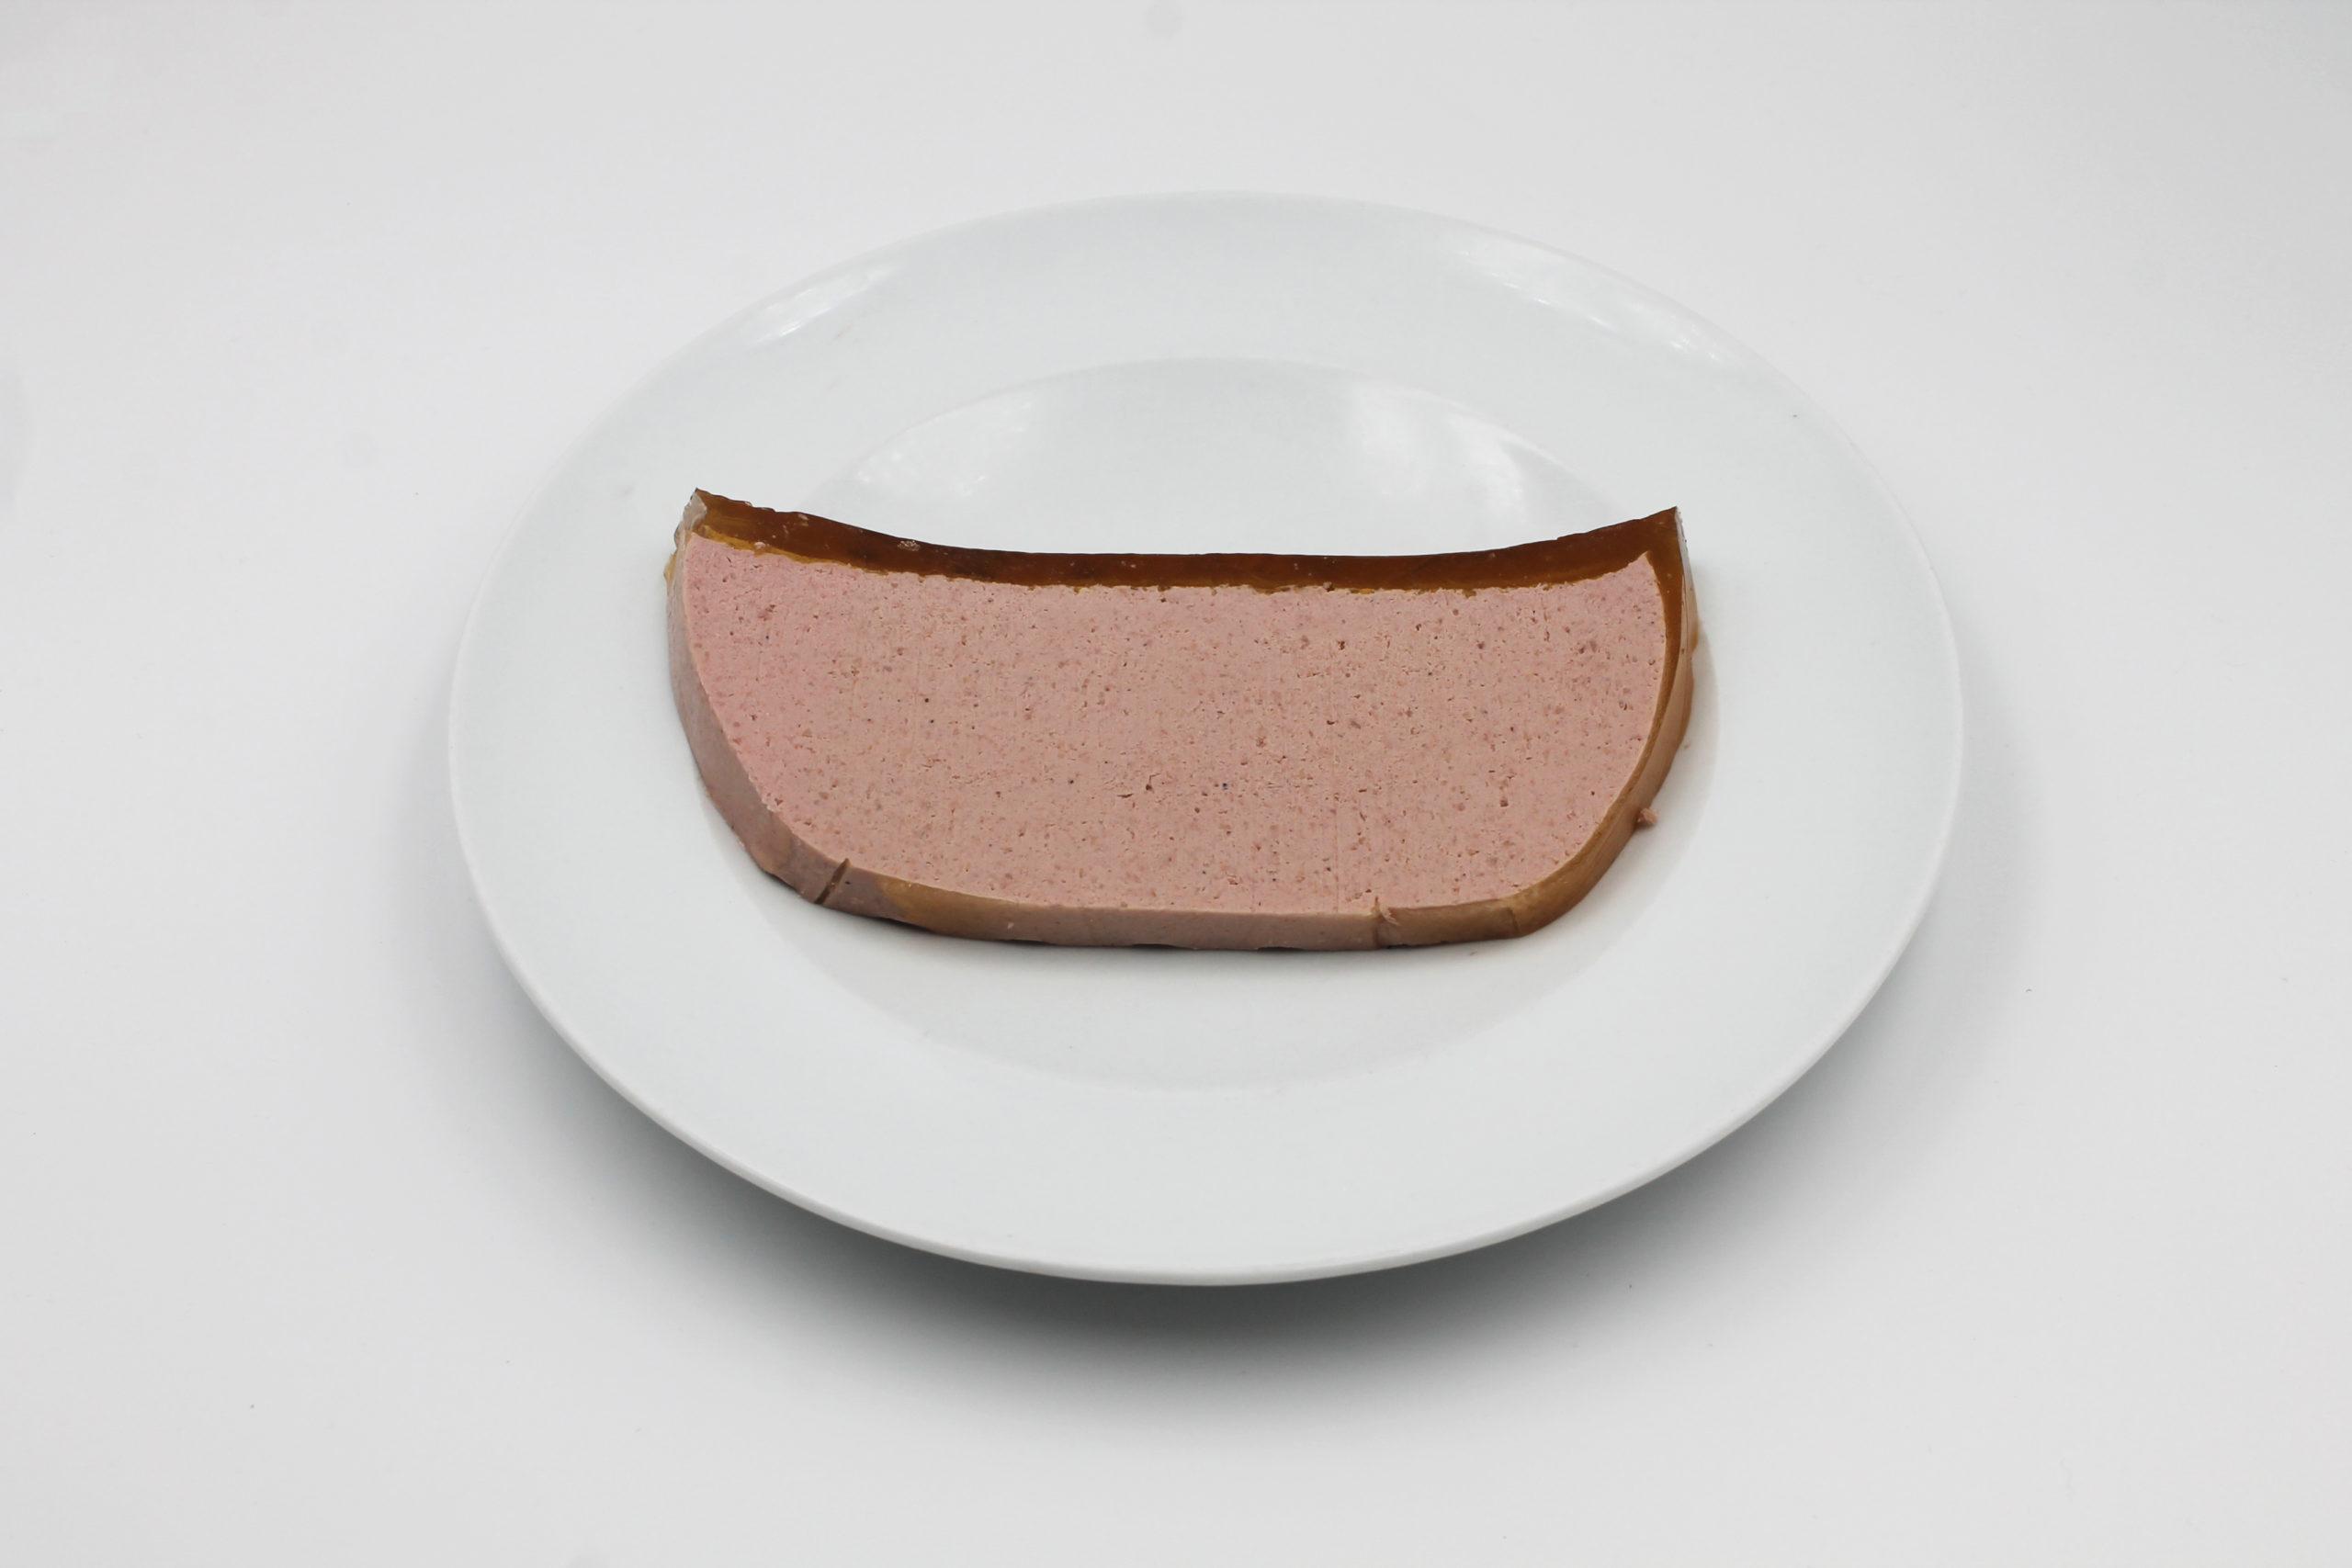 Pâté de foie